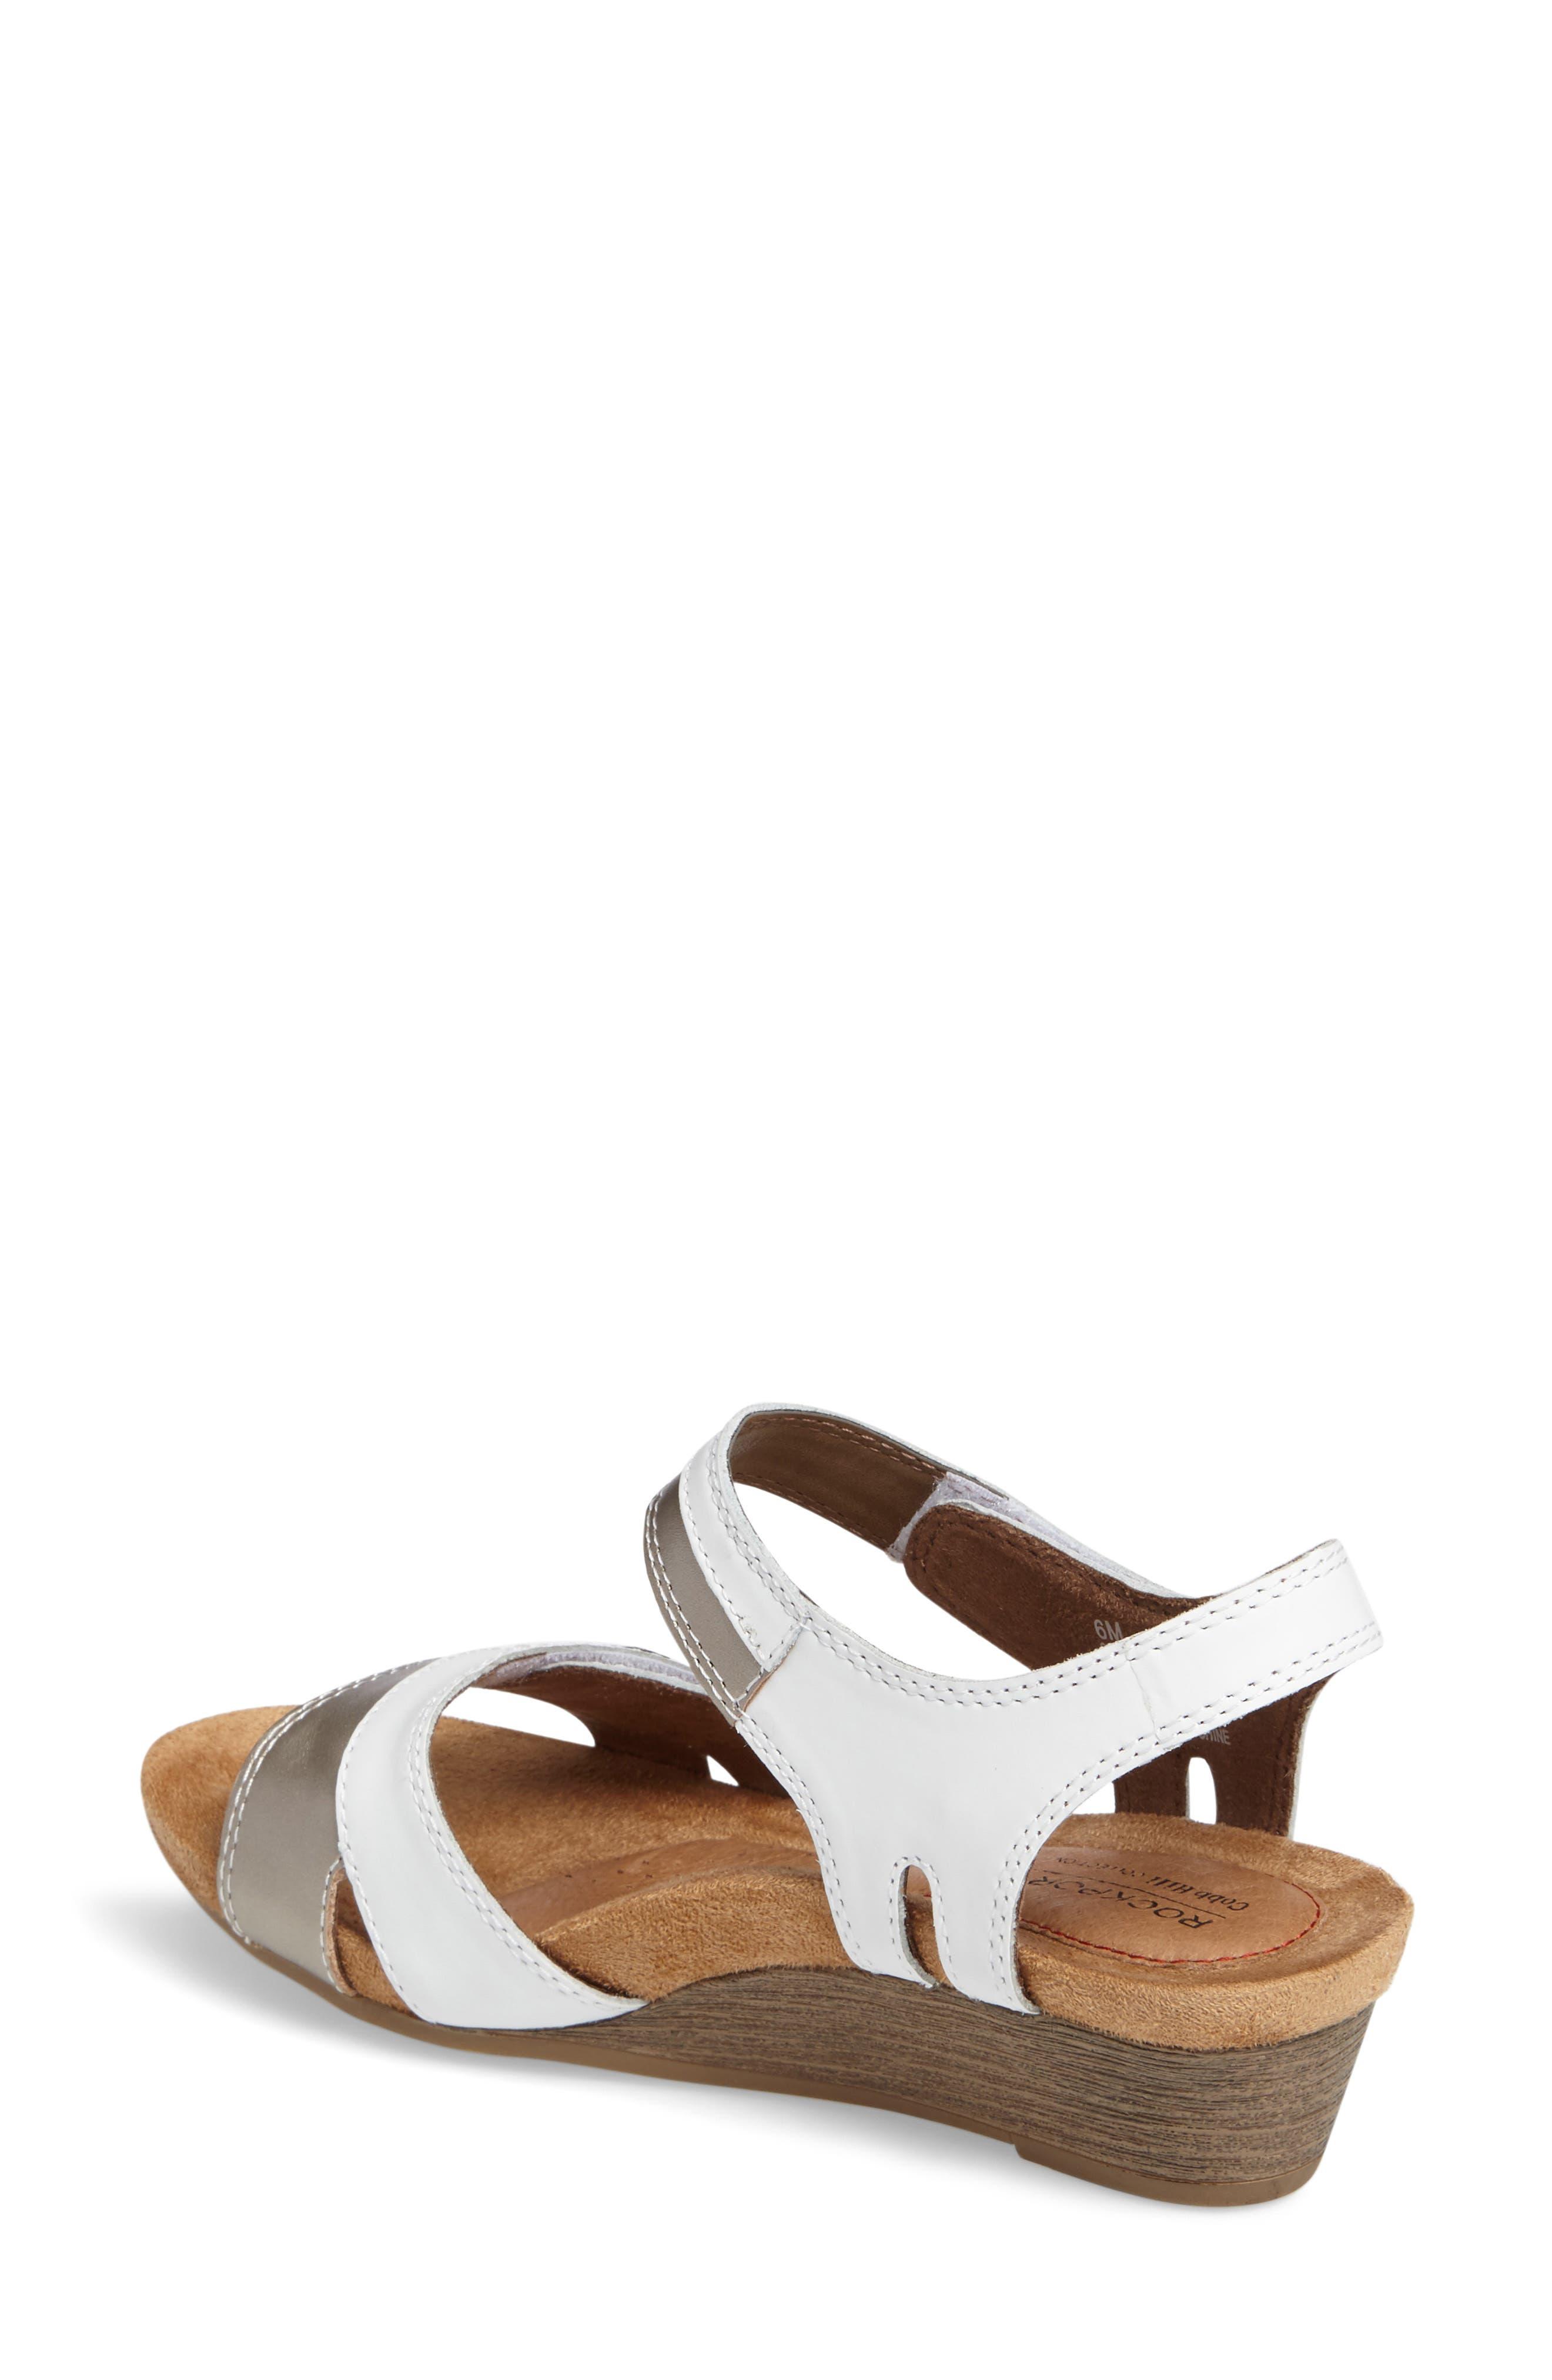 Hollywood Wedge Sandal,                             Alternate thumbnail 2, color,                             White Leather